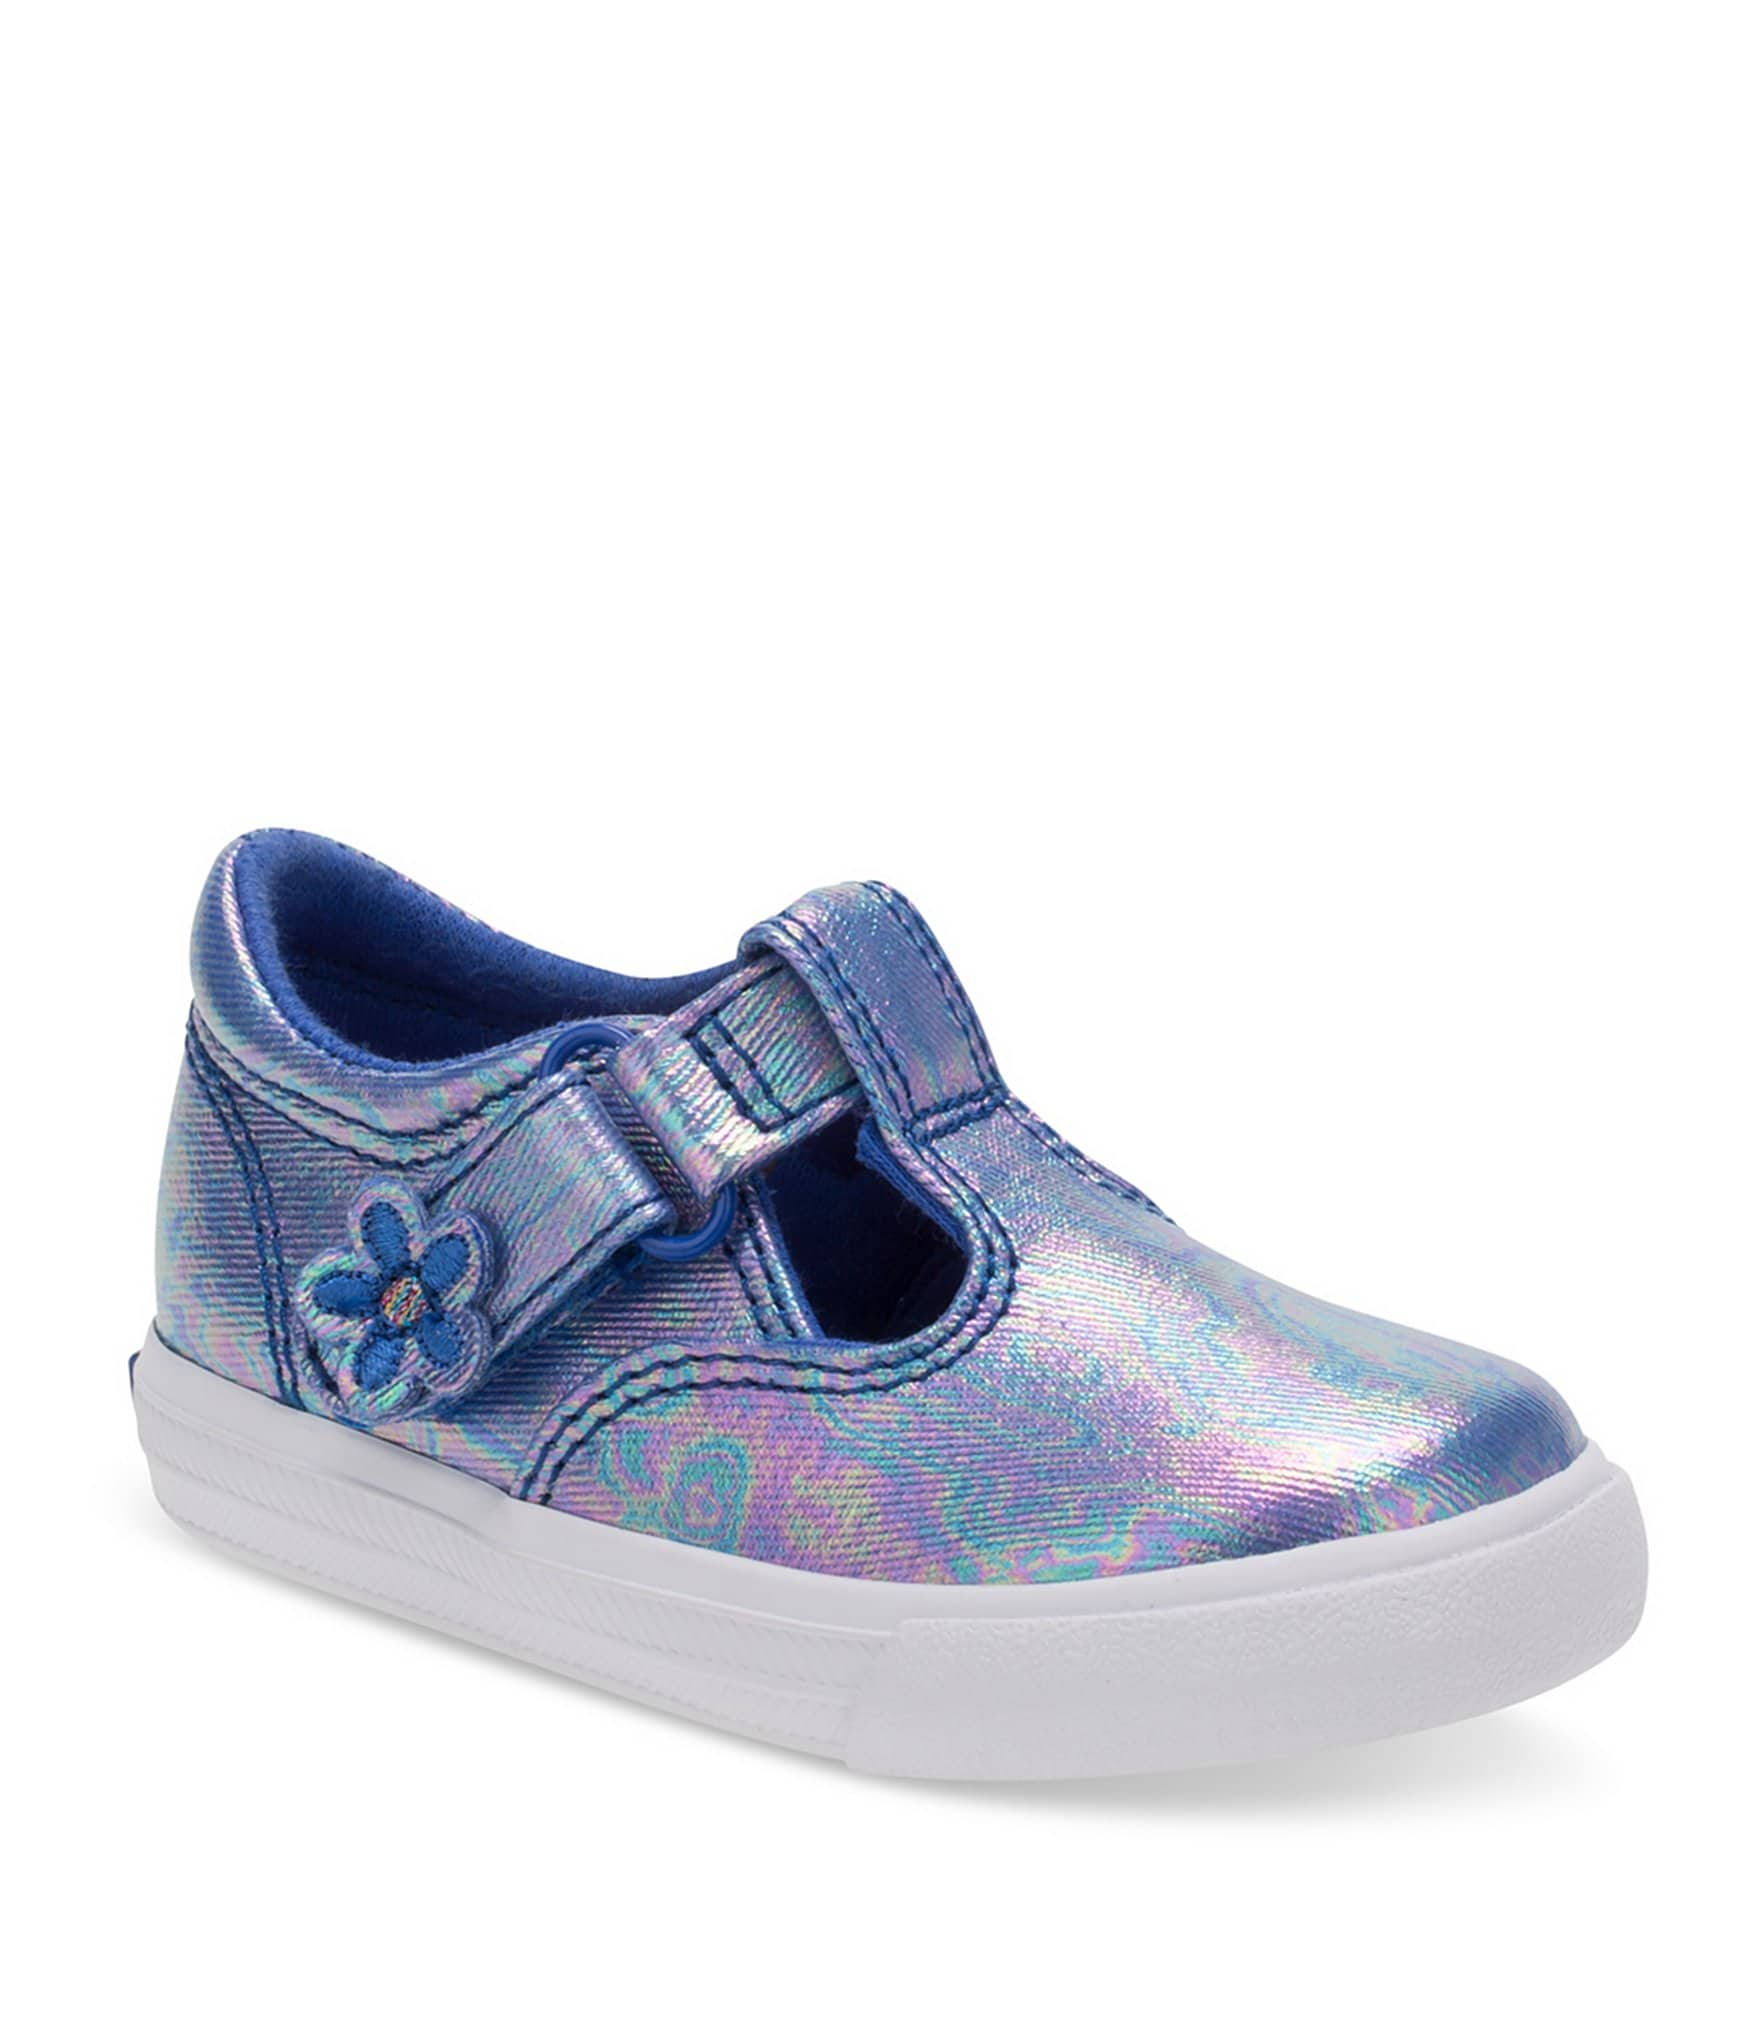 Keds Girls Daphne Shoes Dillards